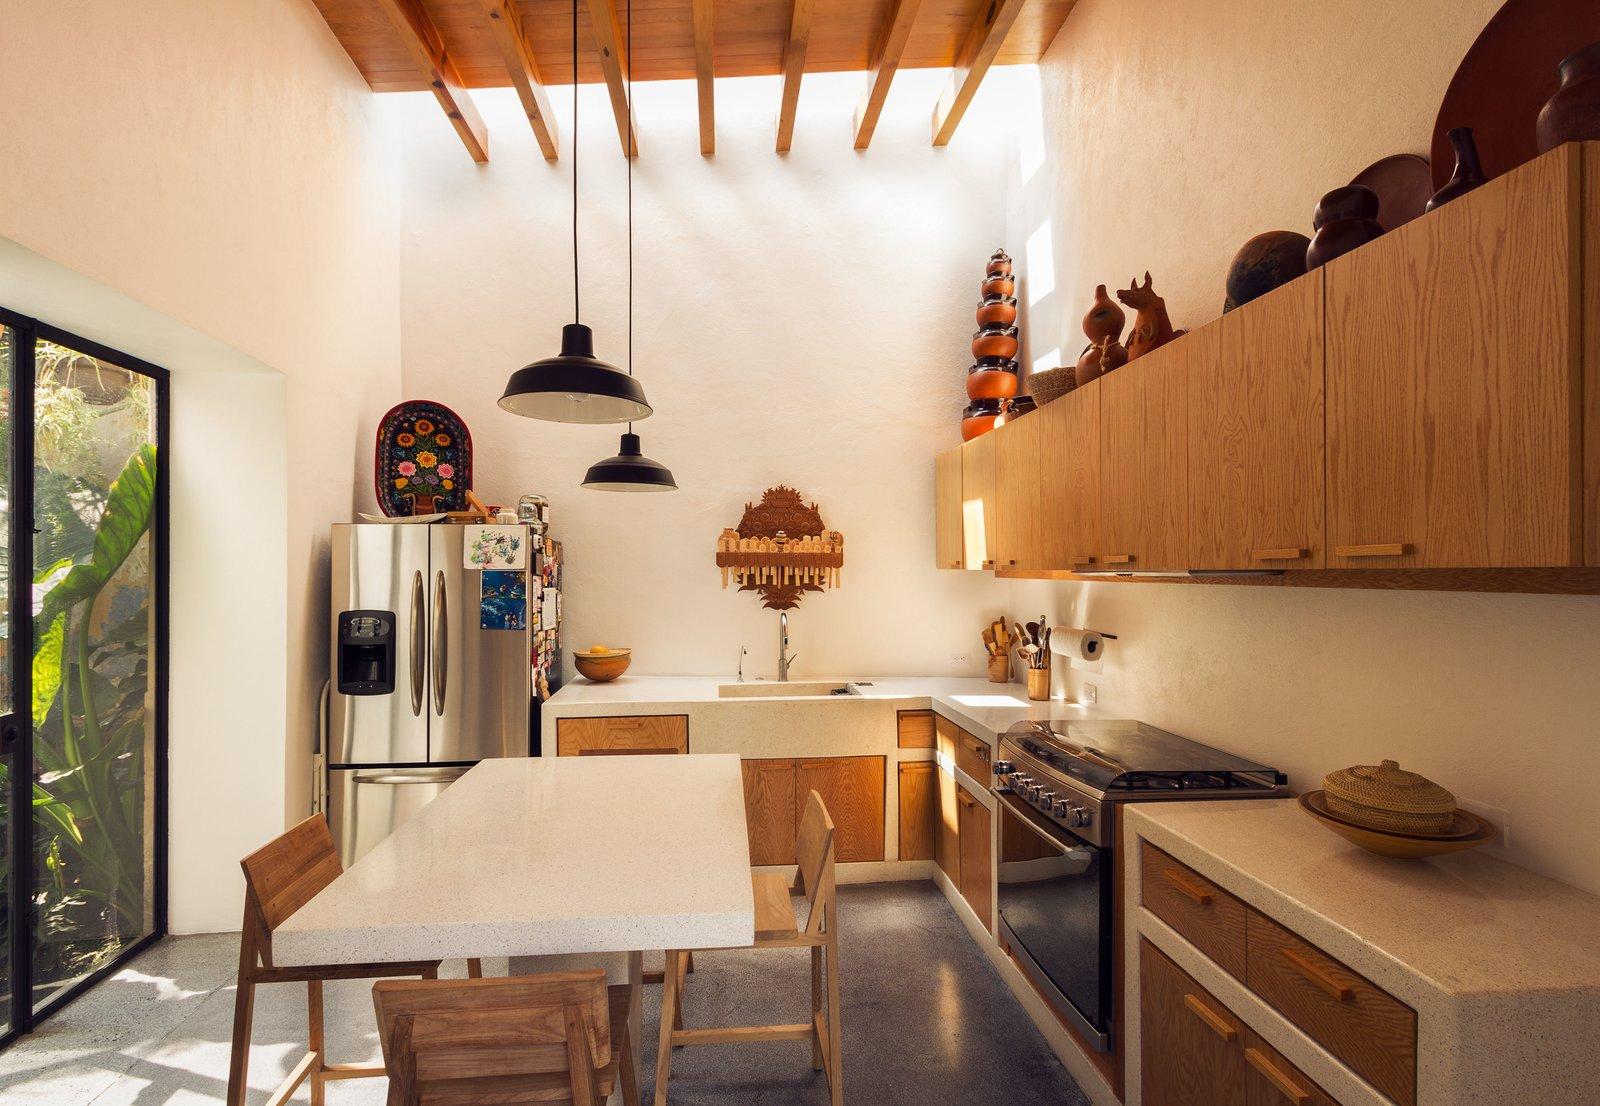 Kitchen, Refrigerator, Wood Cabinet, and Accent Lighting  Veramendi House